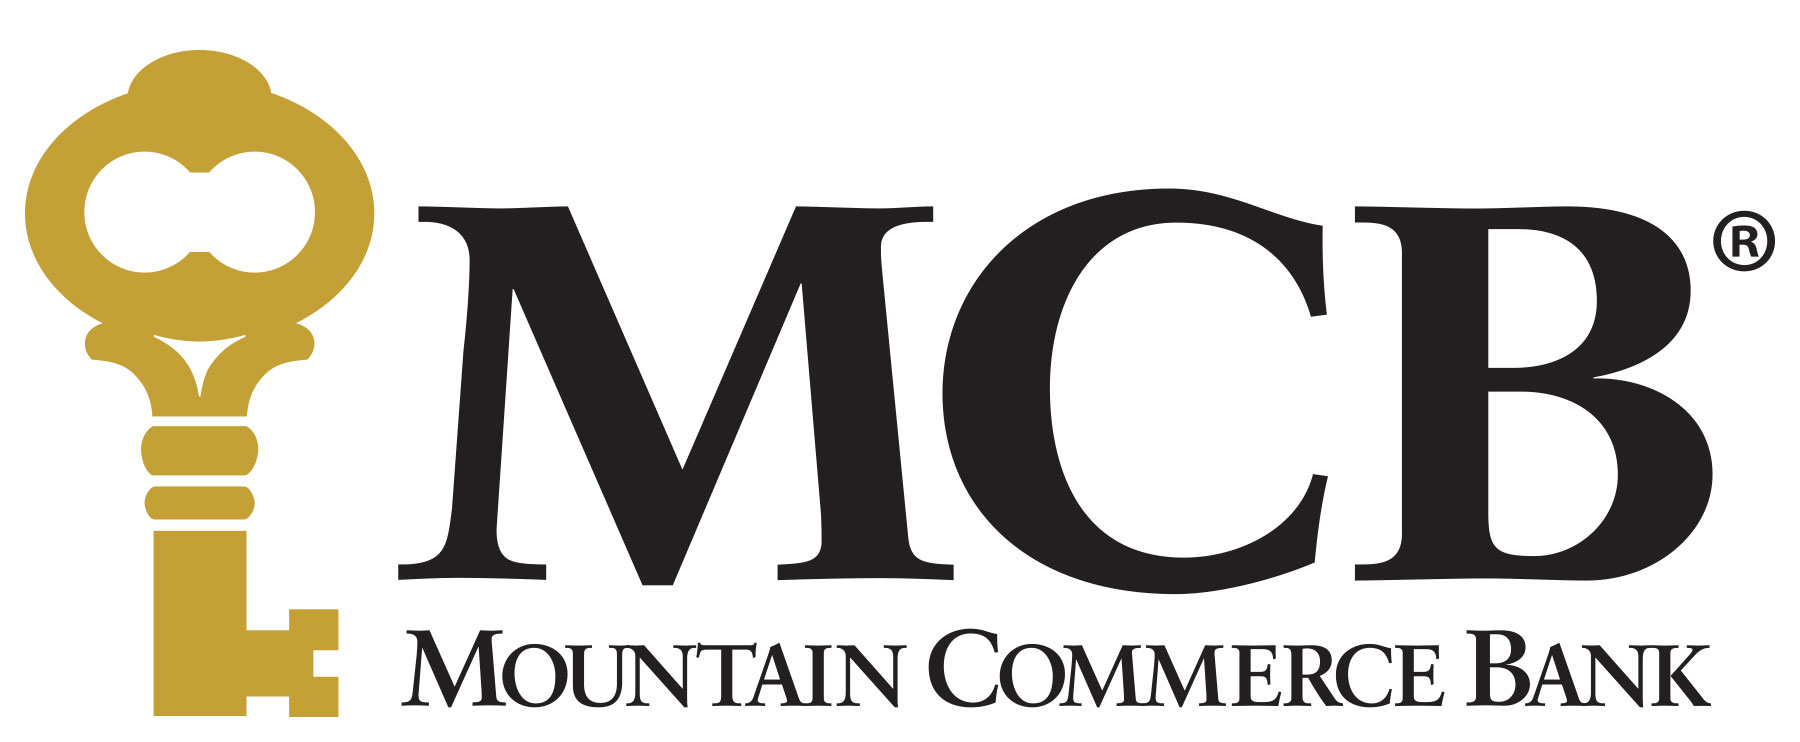 Mountain Commerce Bank